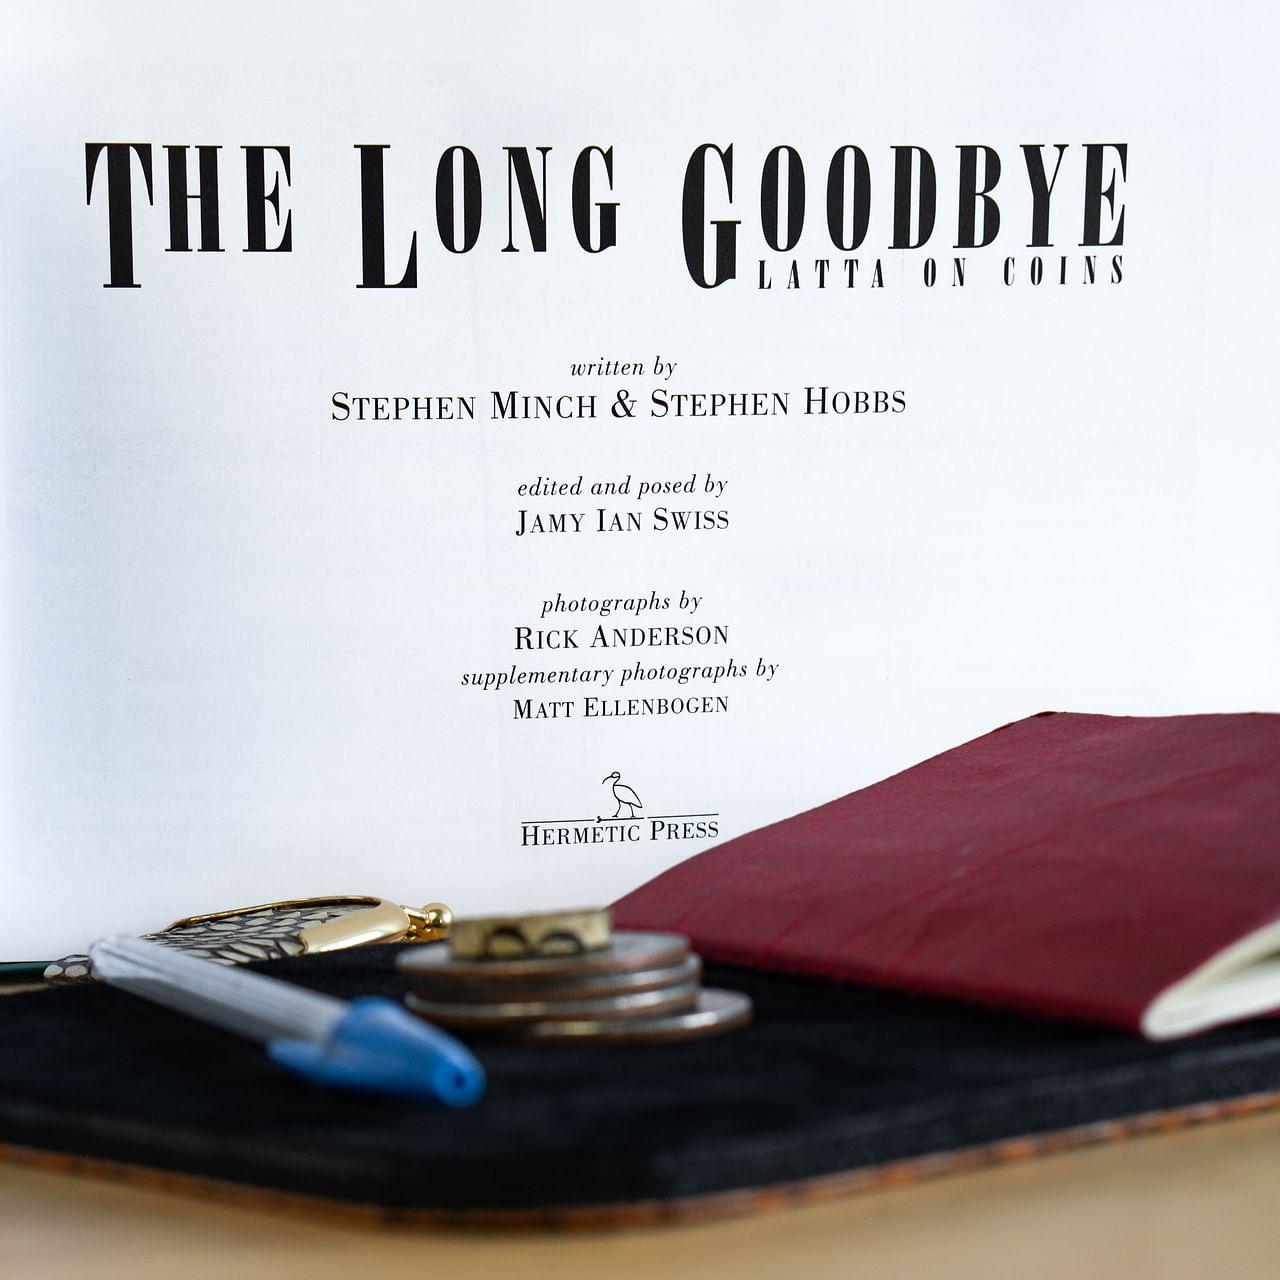 Geoff Latta: The Long Goodbye (Book + DVD) - magic